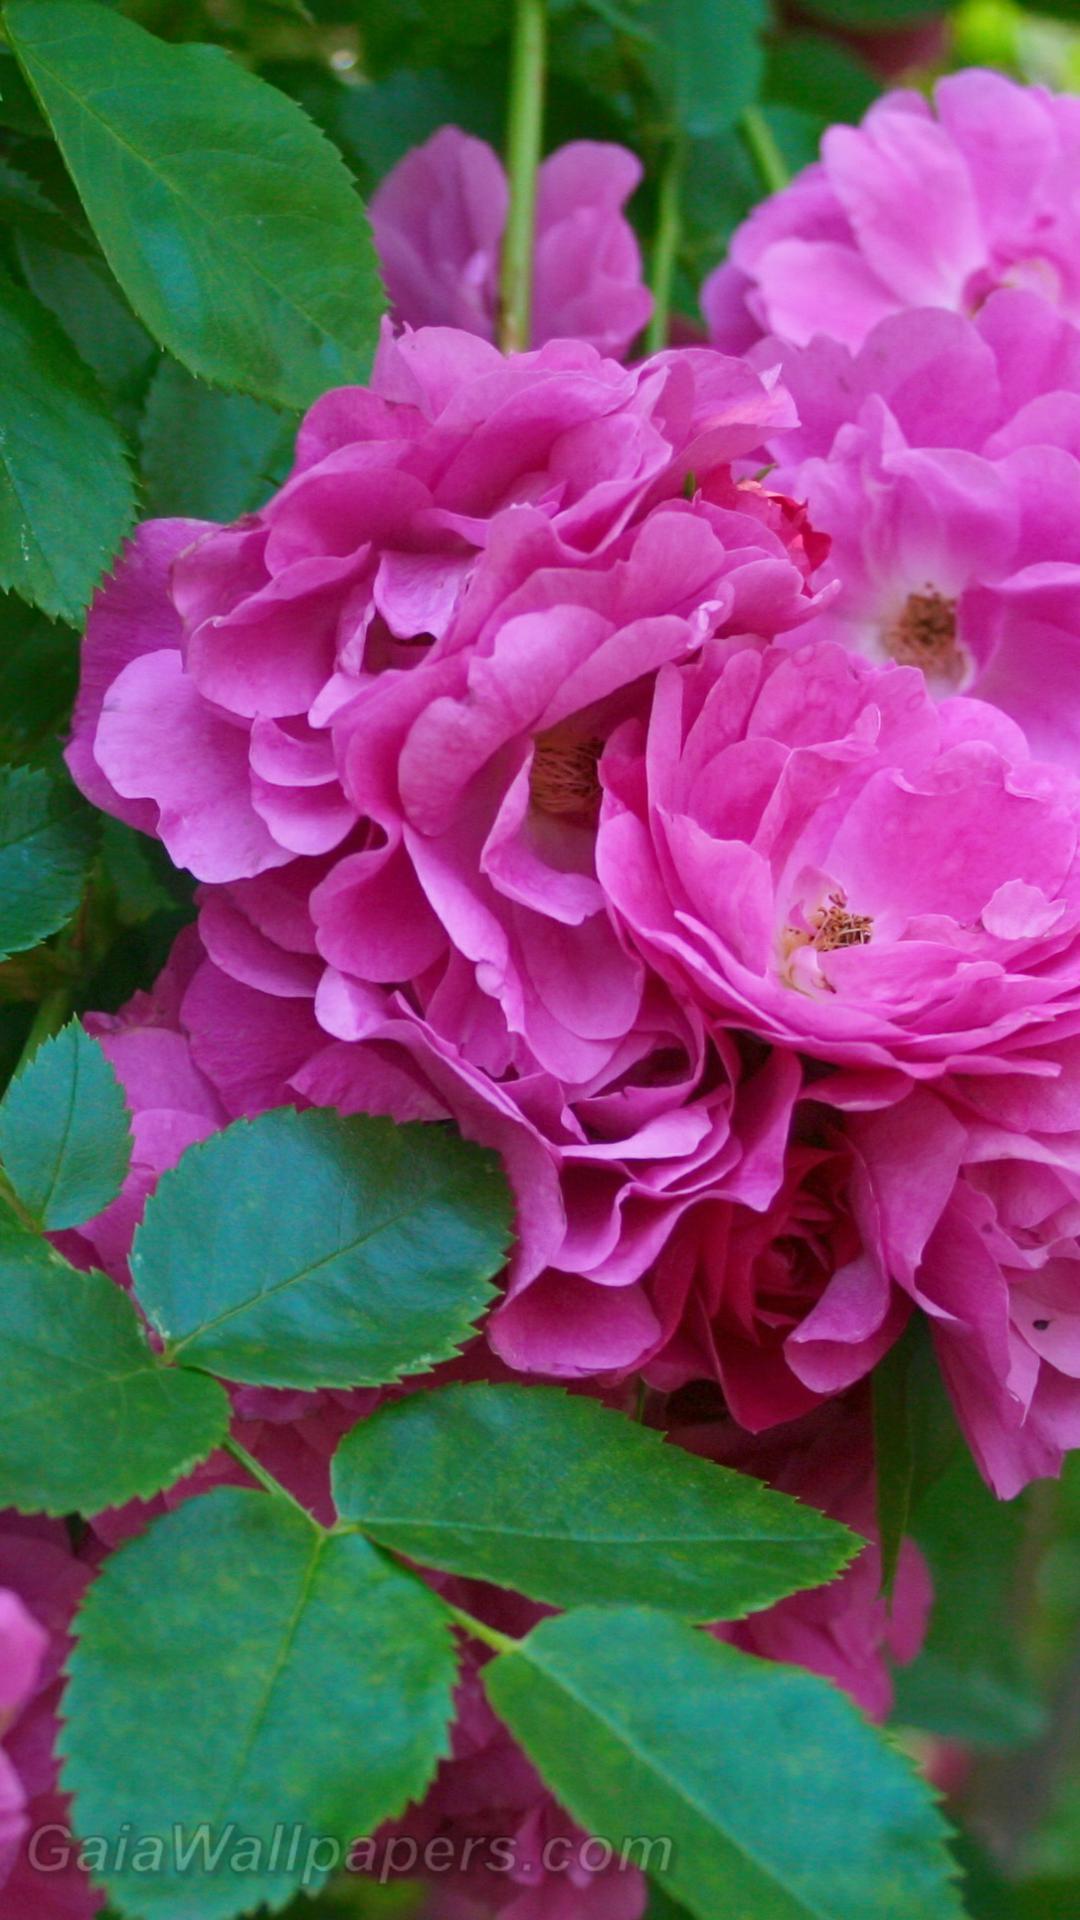 Roses so pink - Free desktop wallpapers